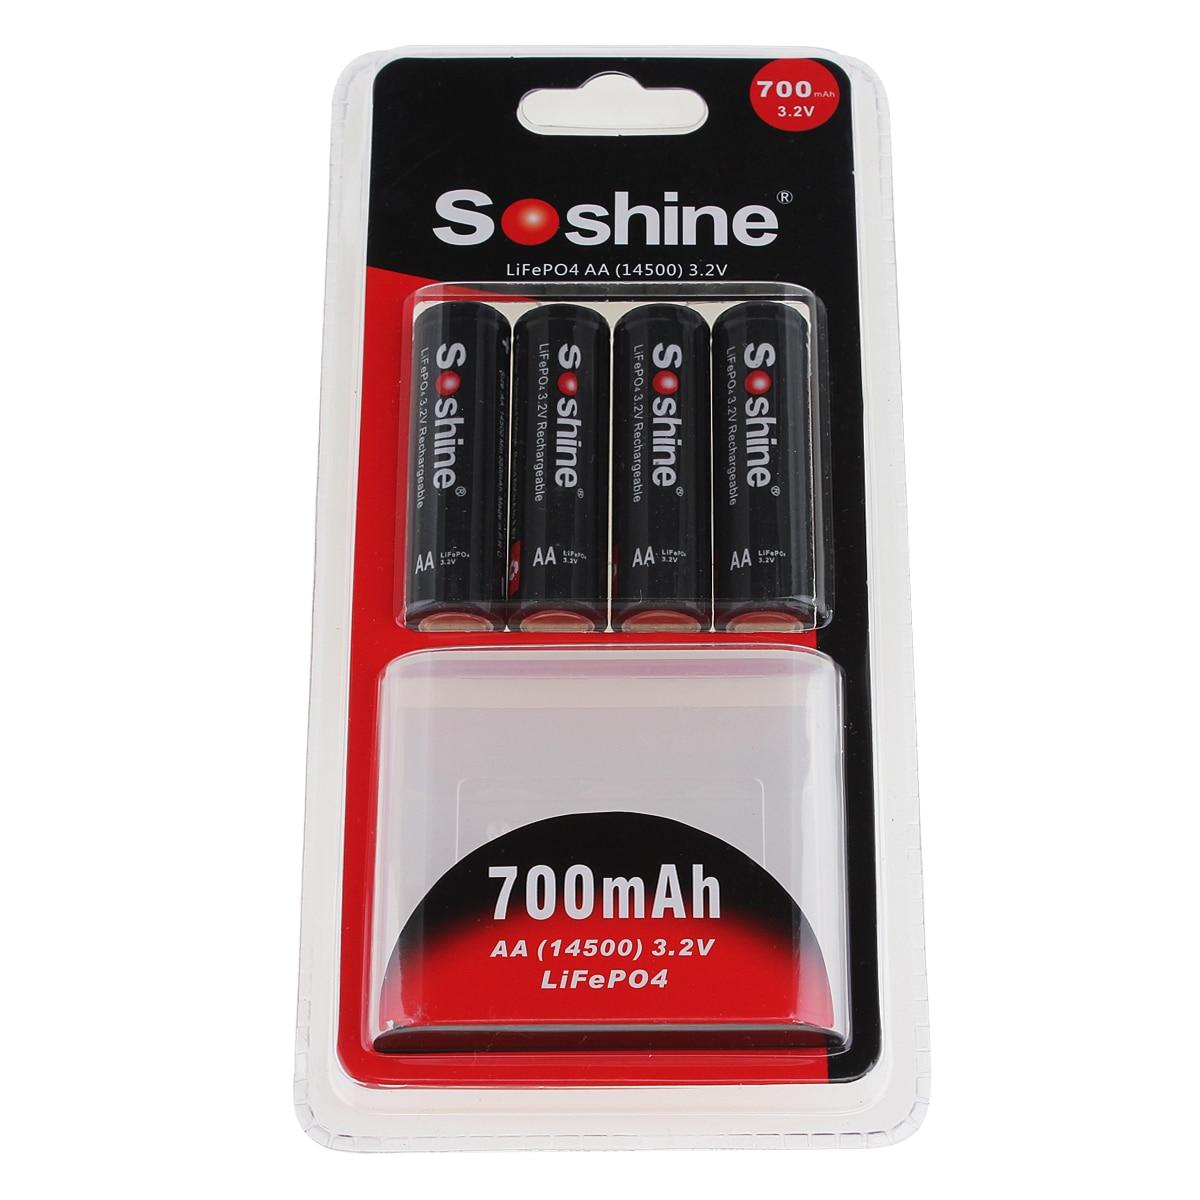 Baterias Recarregáveis lifepo4 bateria pilas recargables aa Tipo : Li-ion